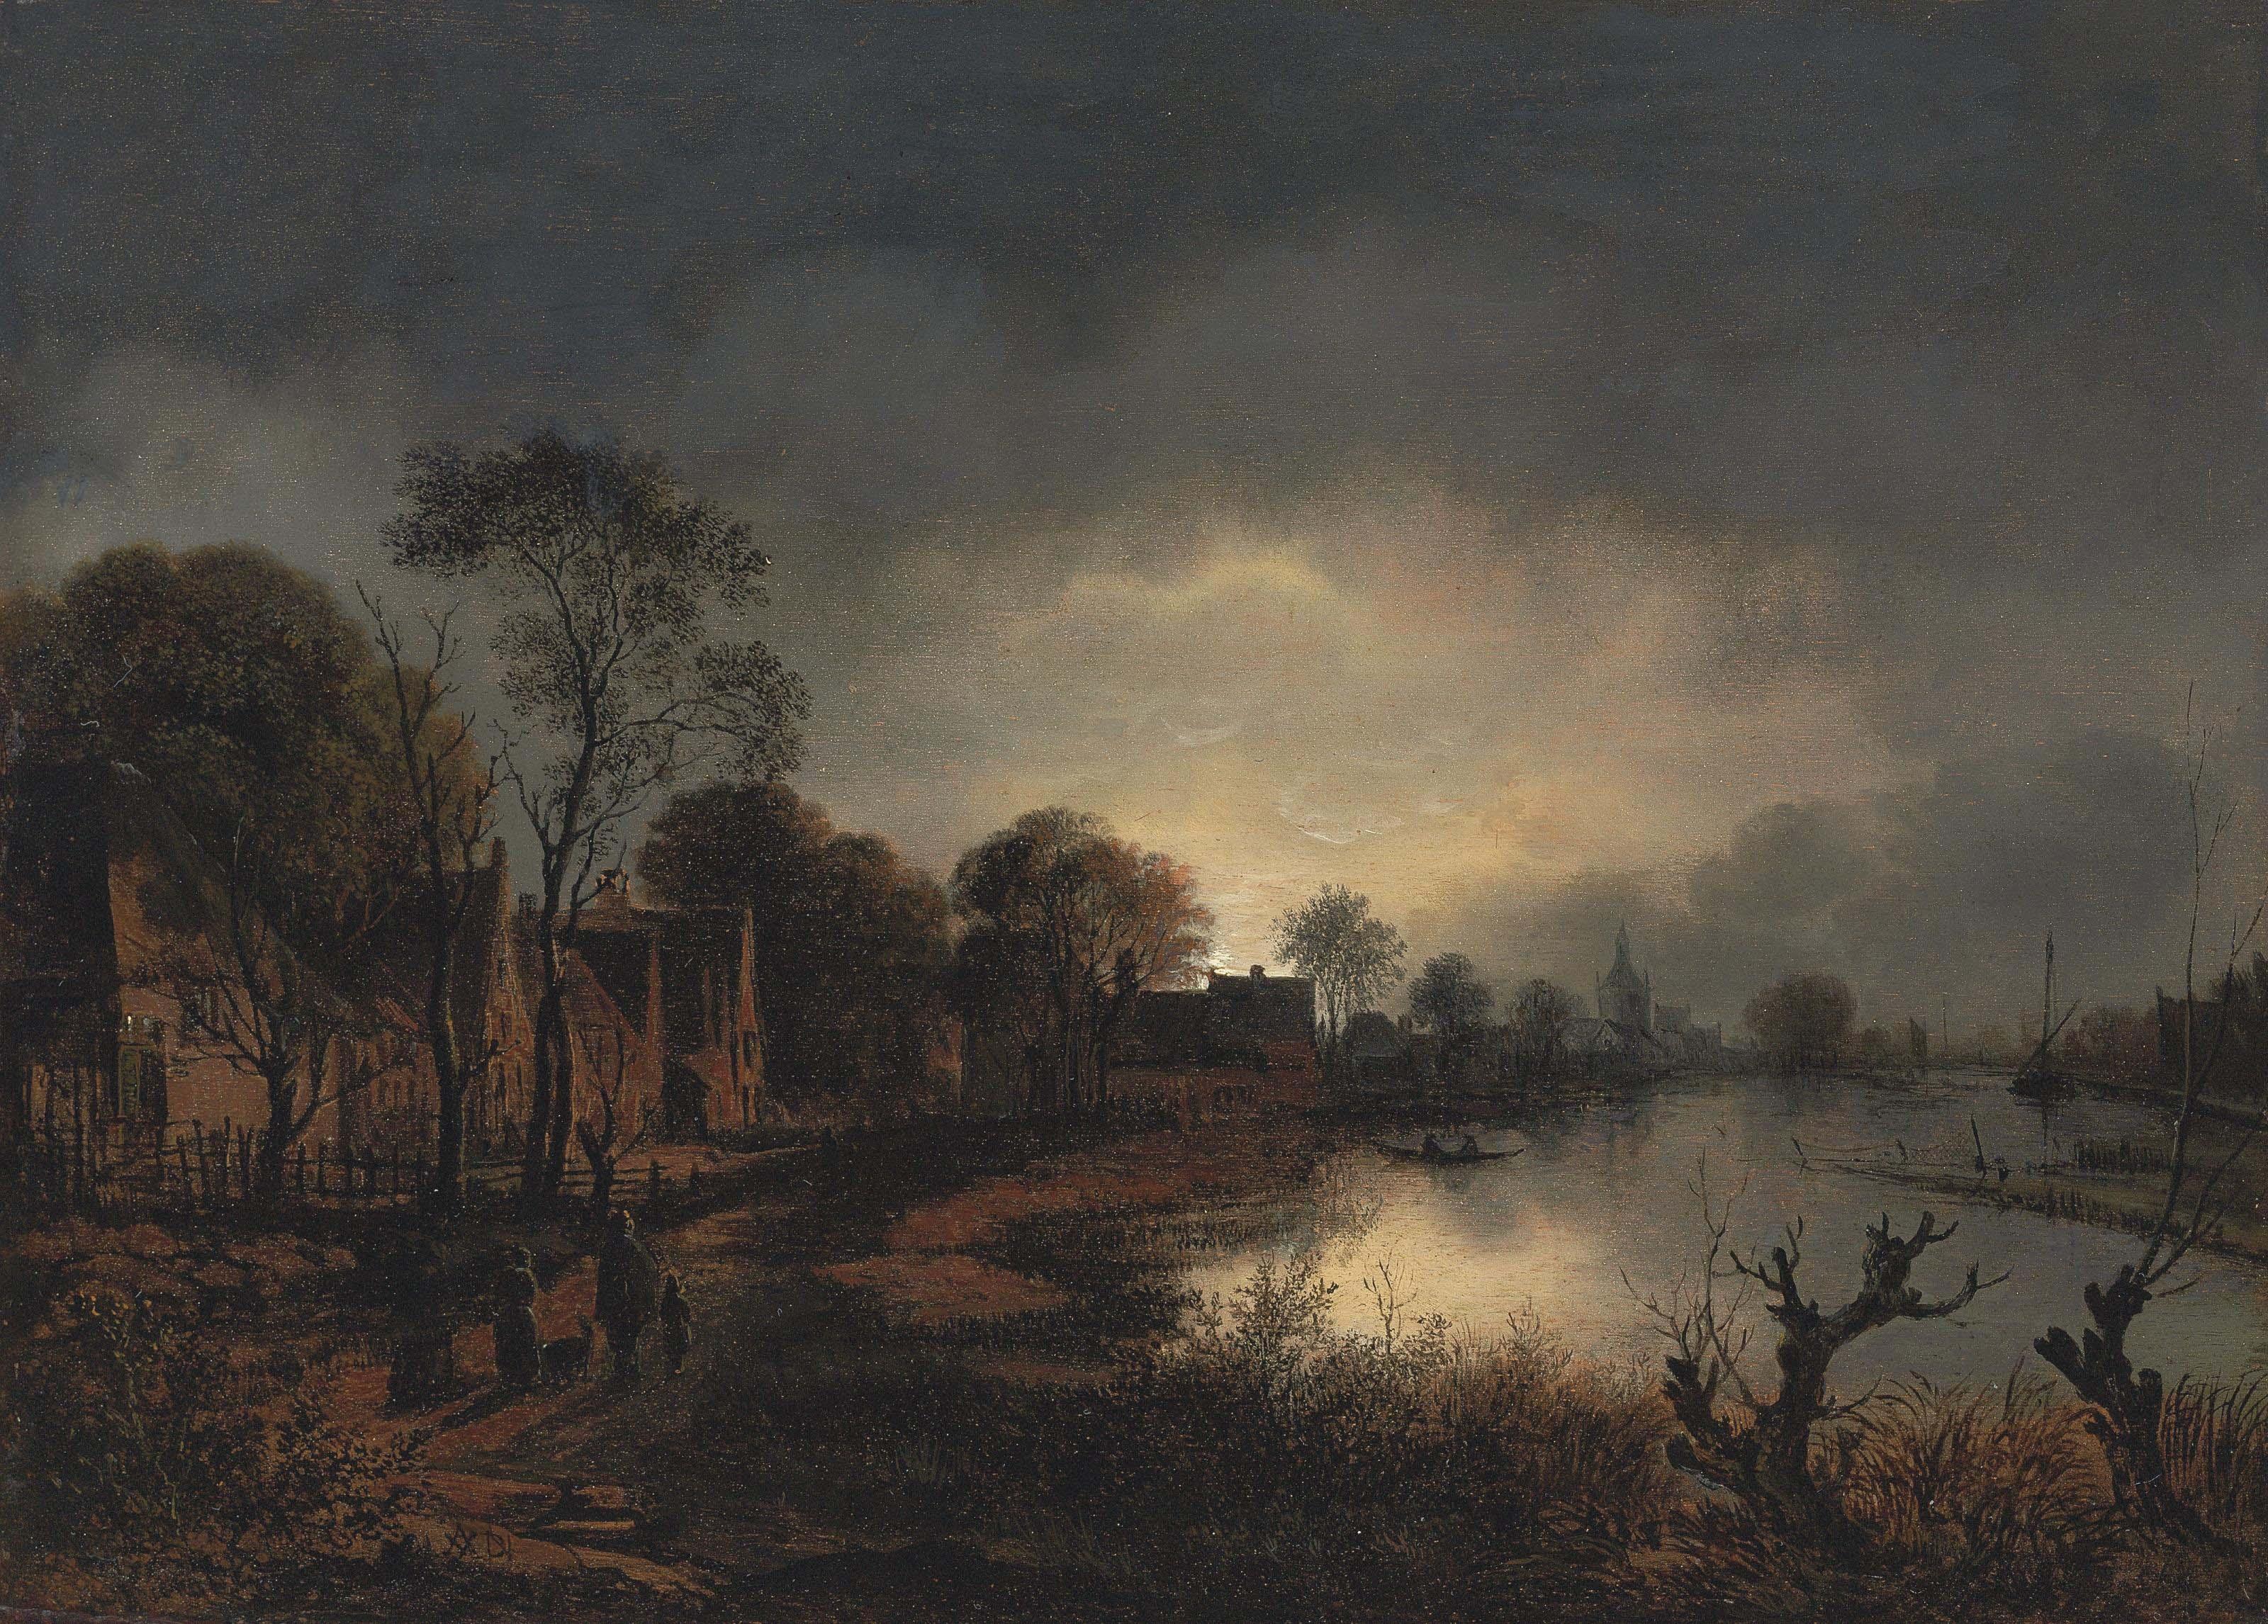 Attributed to Aert van der Nee